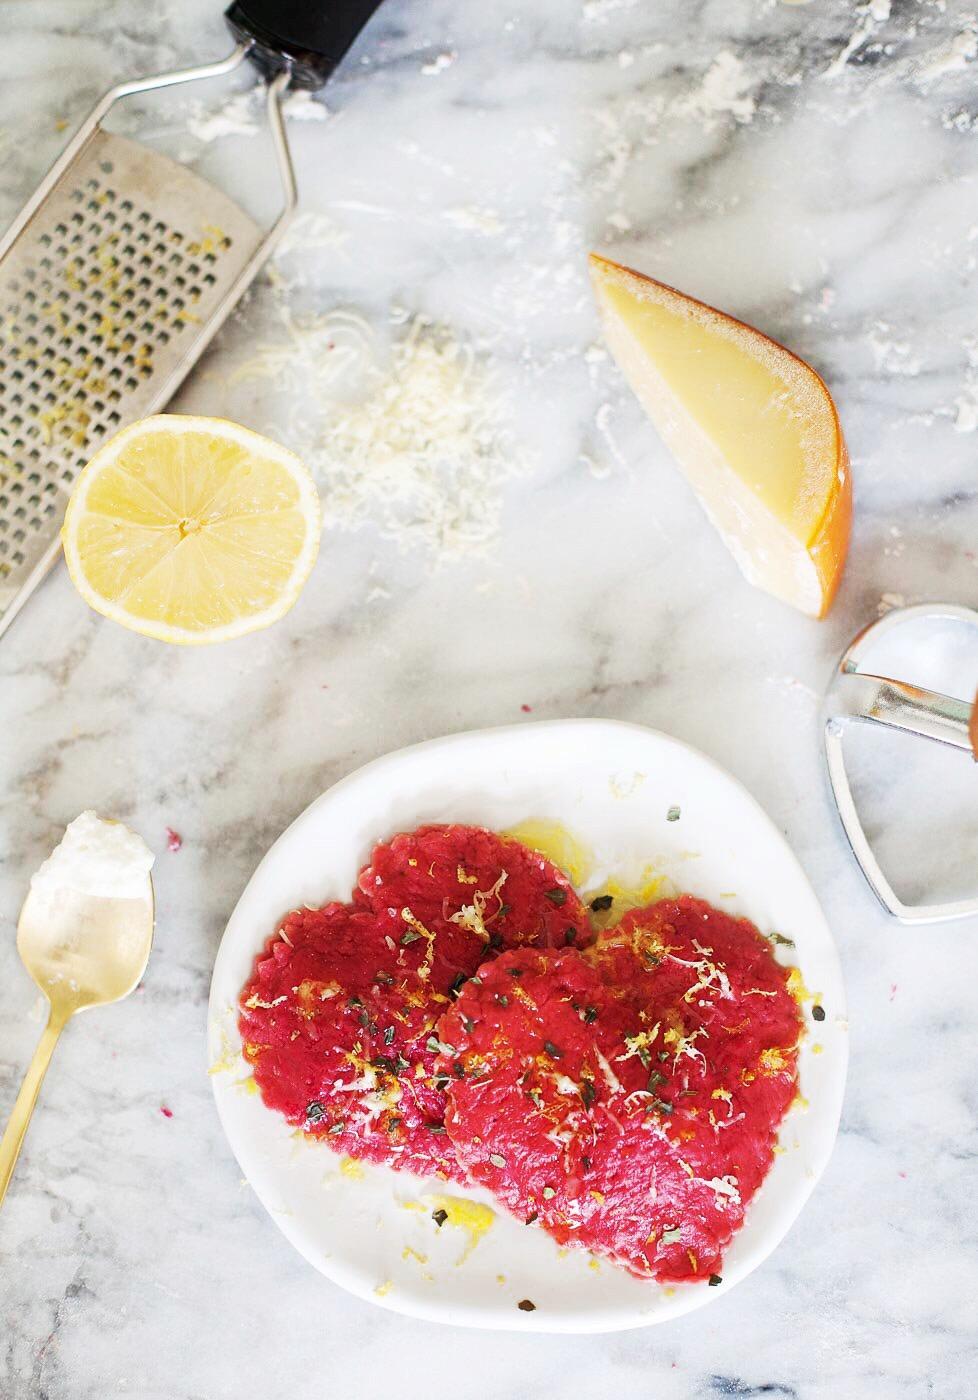 Heart Shaped Lemon Sage And Ricotta Beet Ravioli